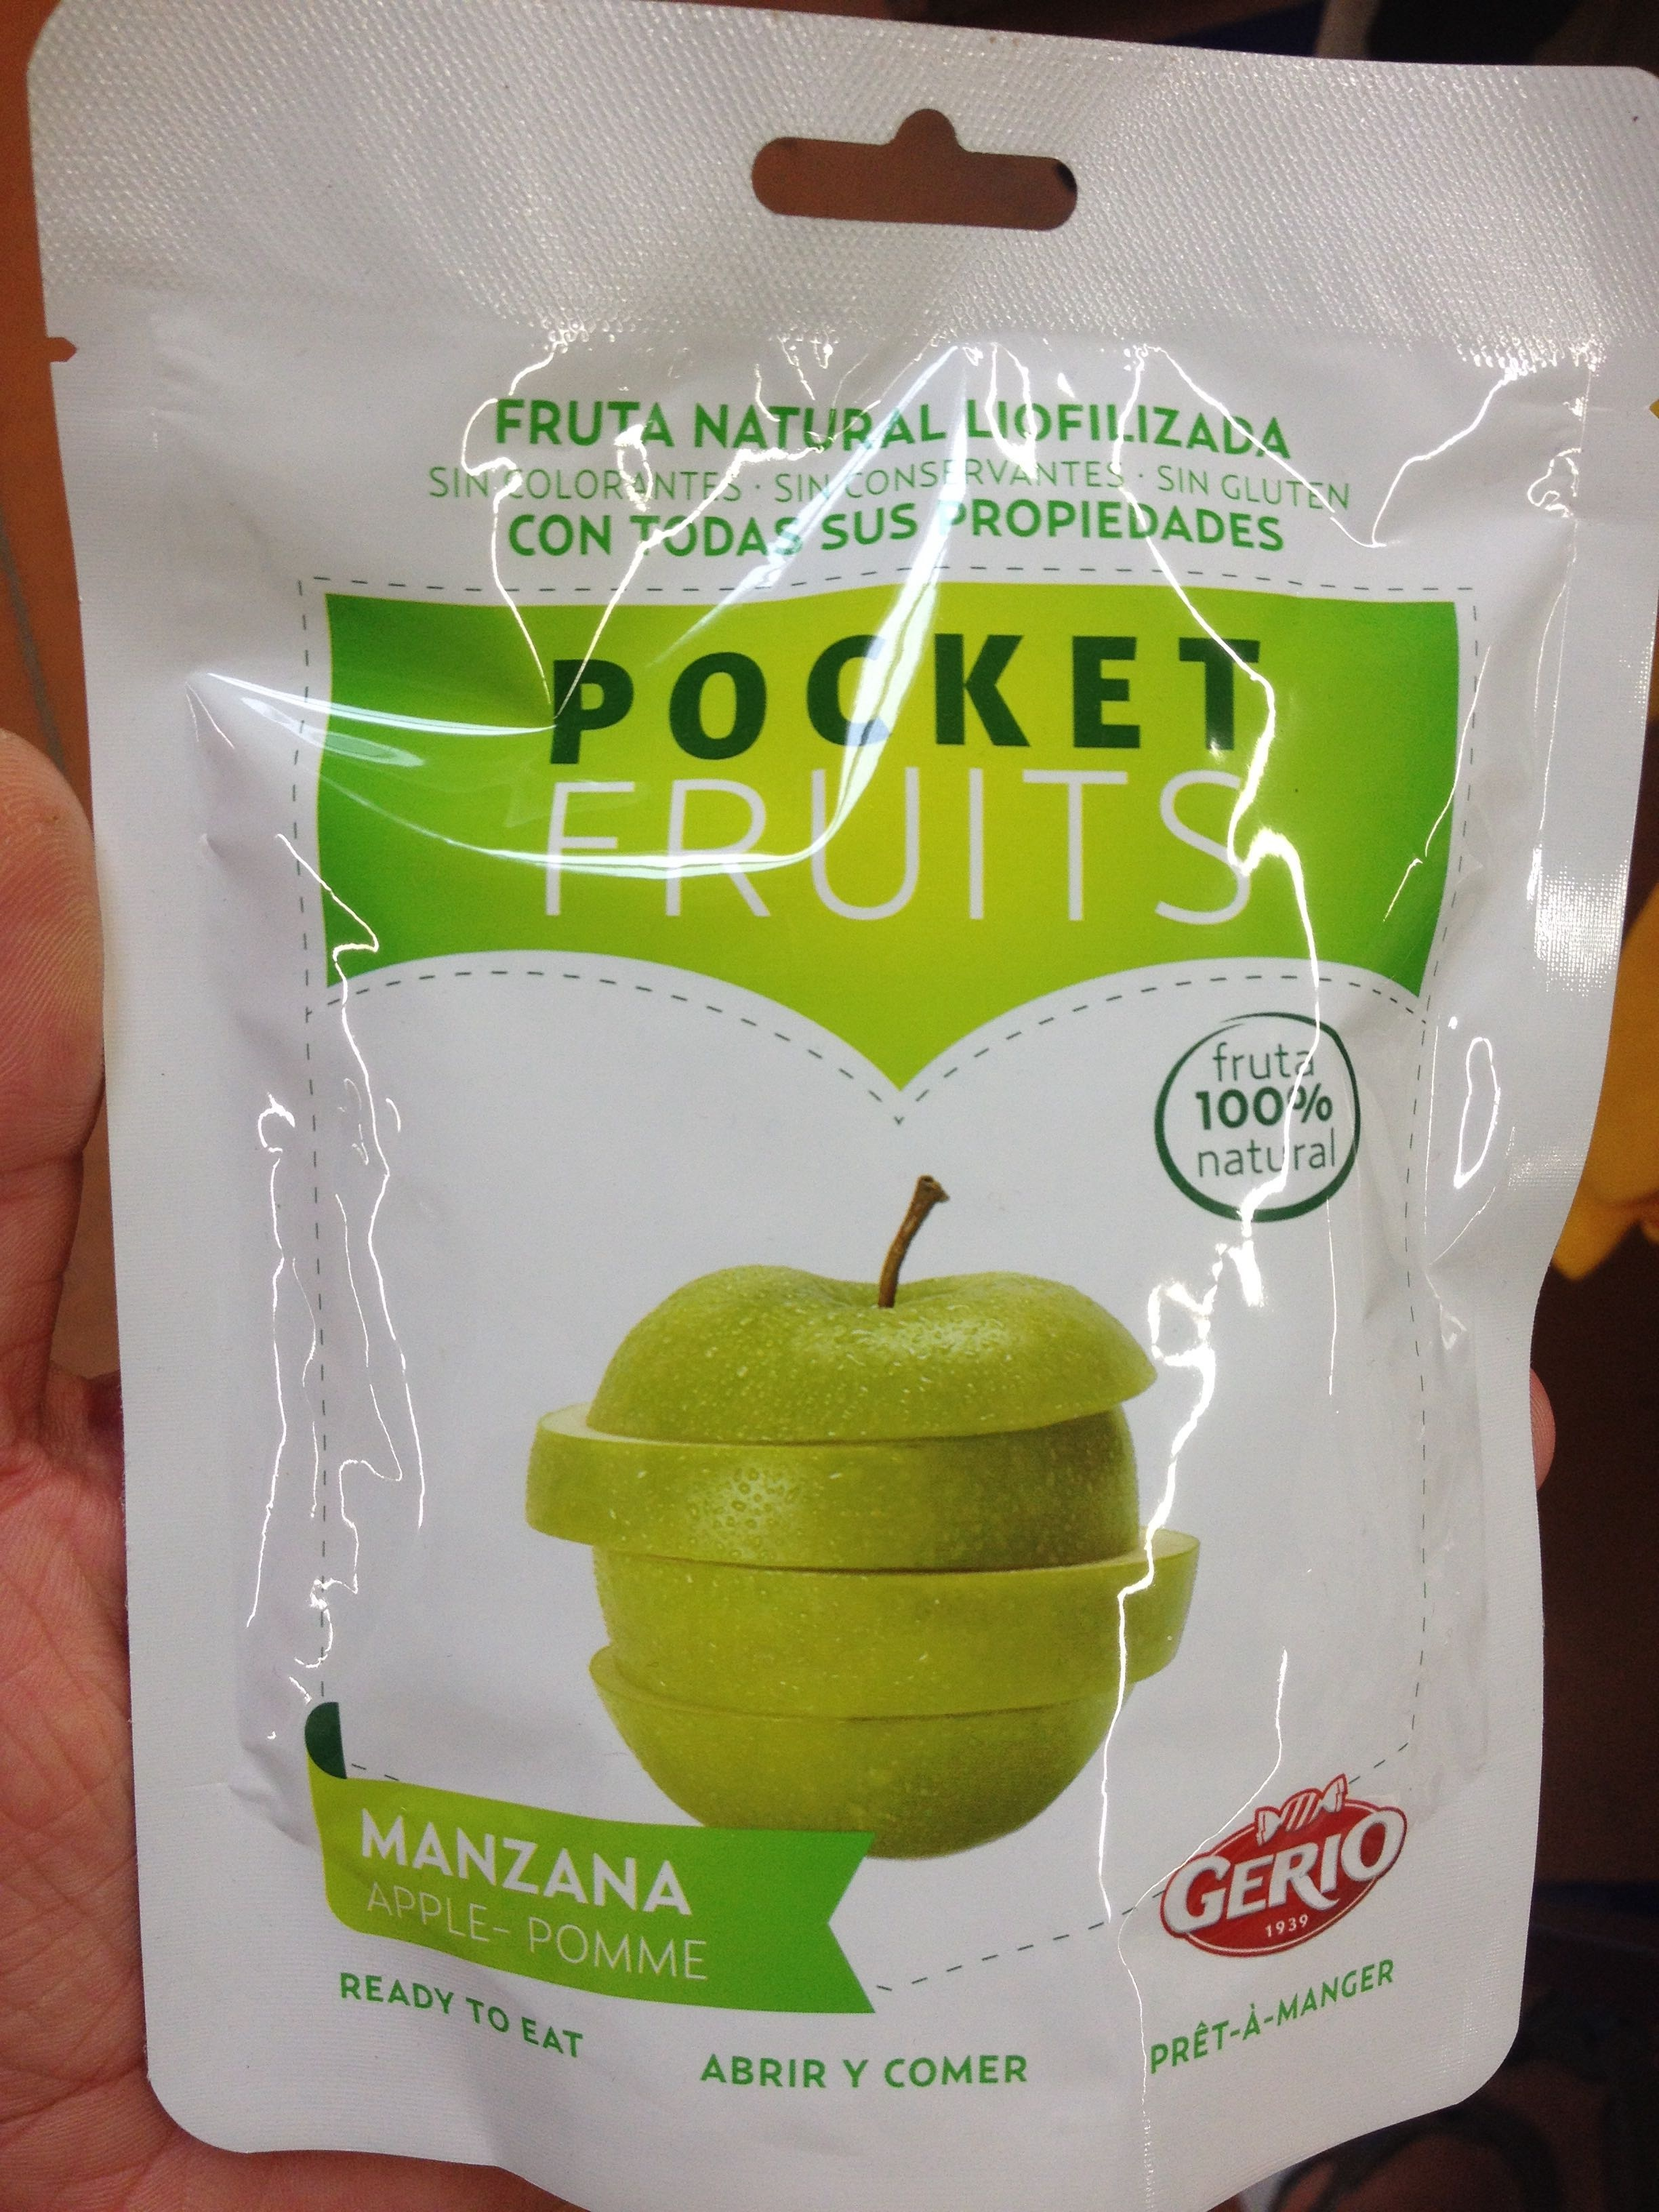 Pocket fruits - Pomme - Produit - fr